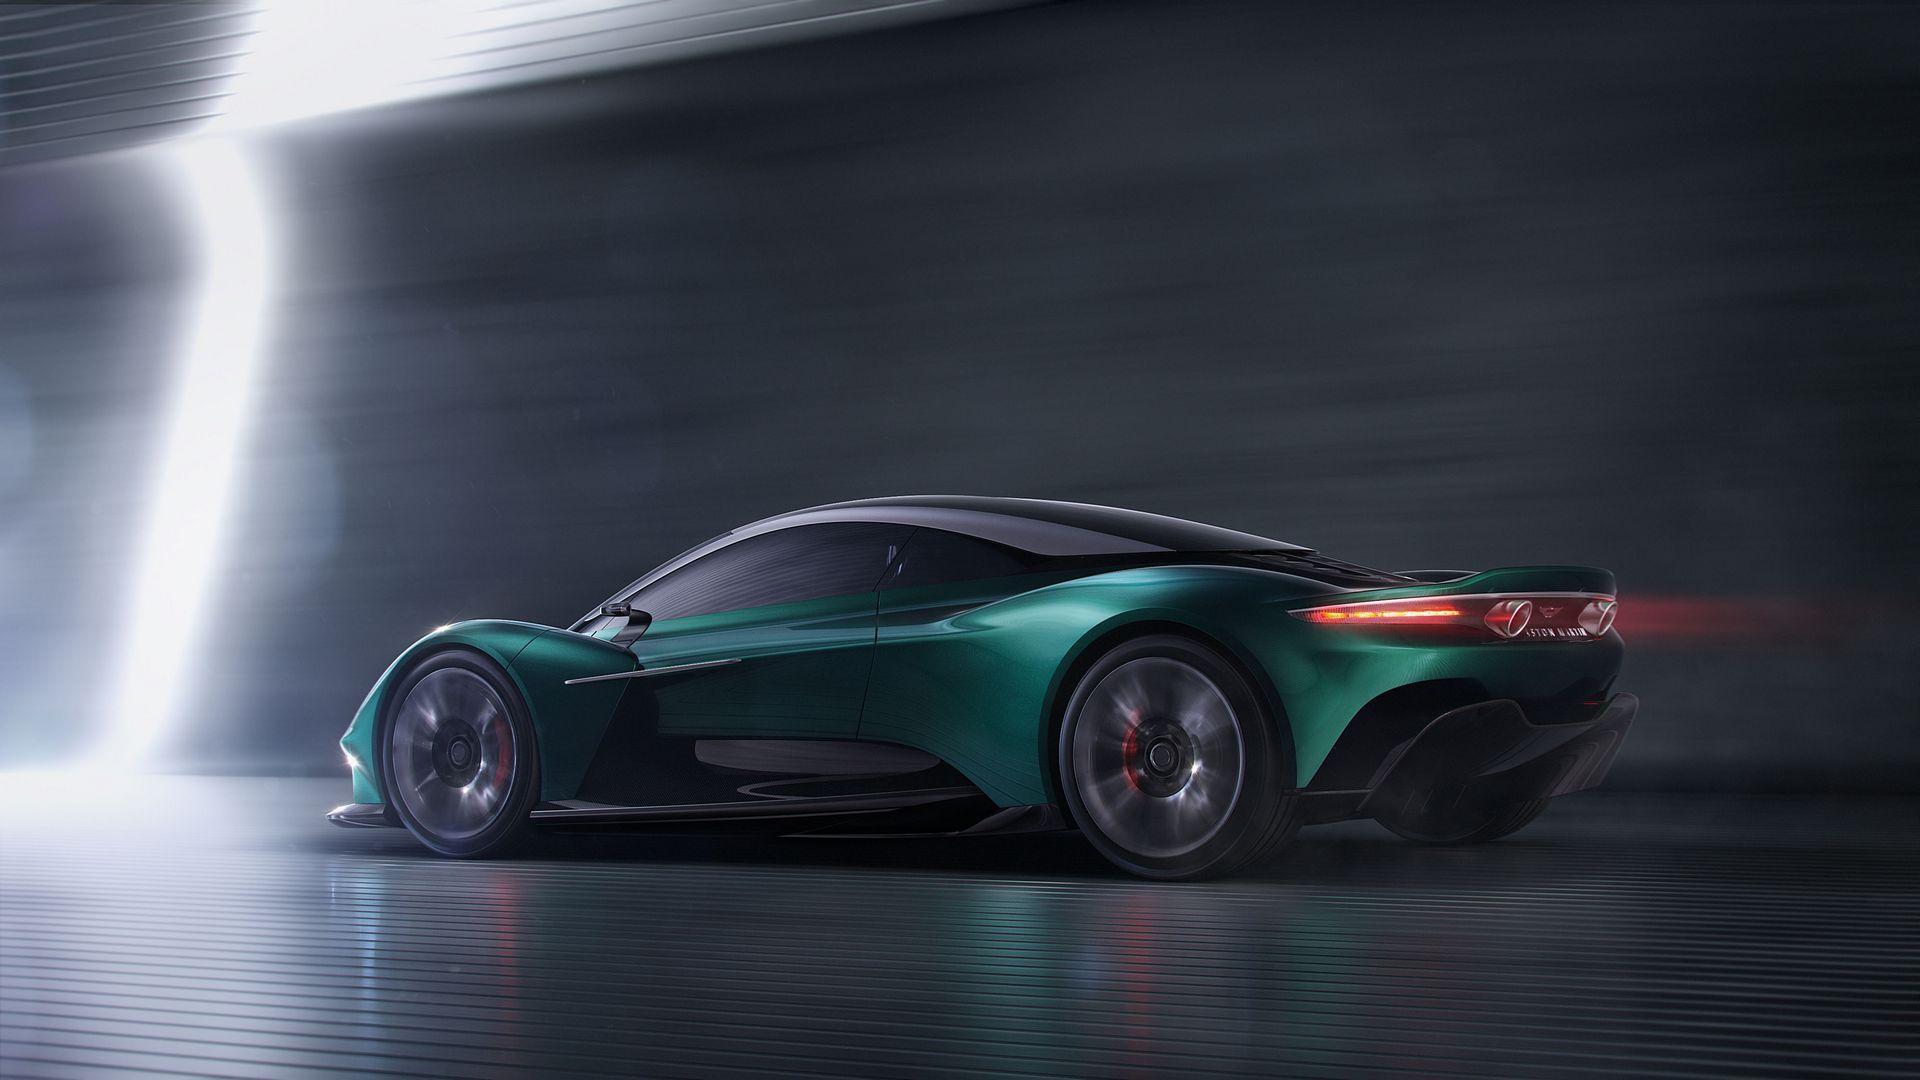 Aston Martin Vanquish Vision Concept (2)